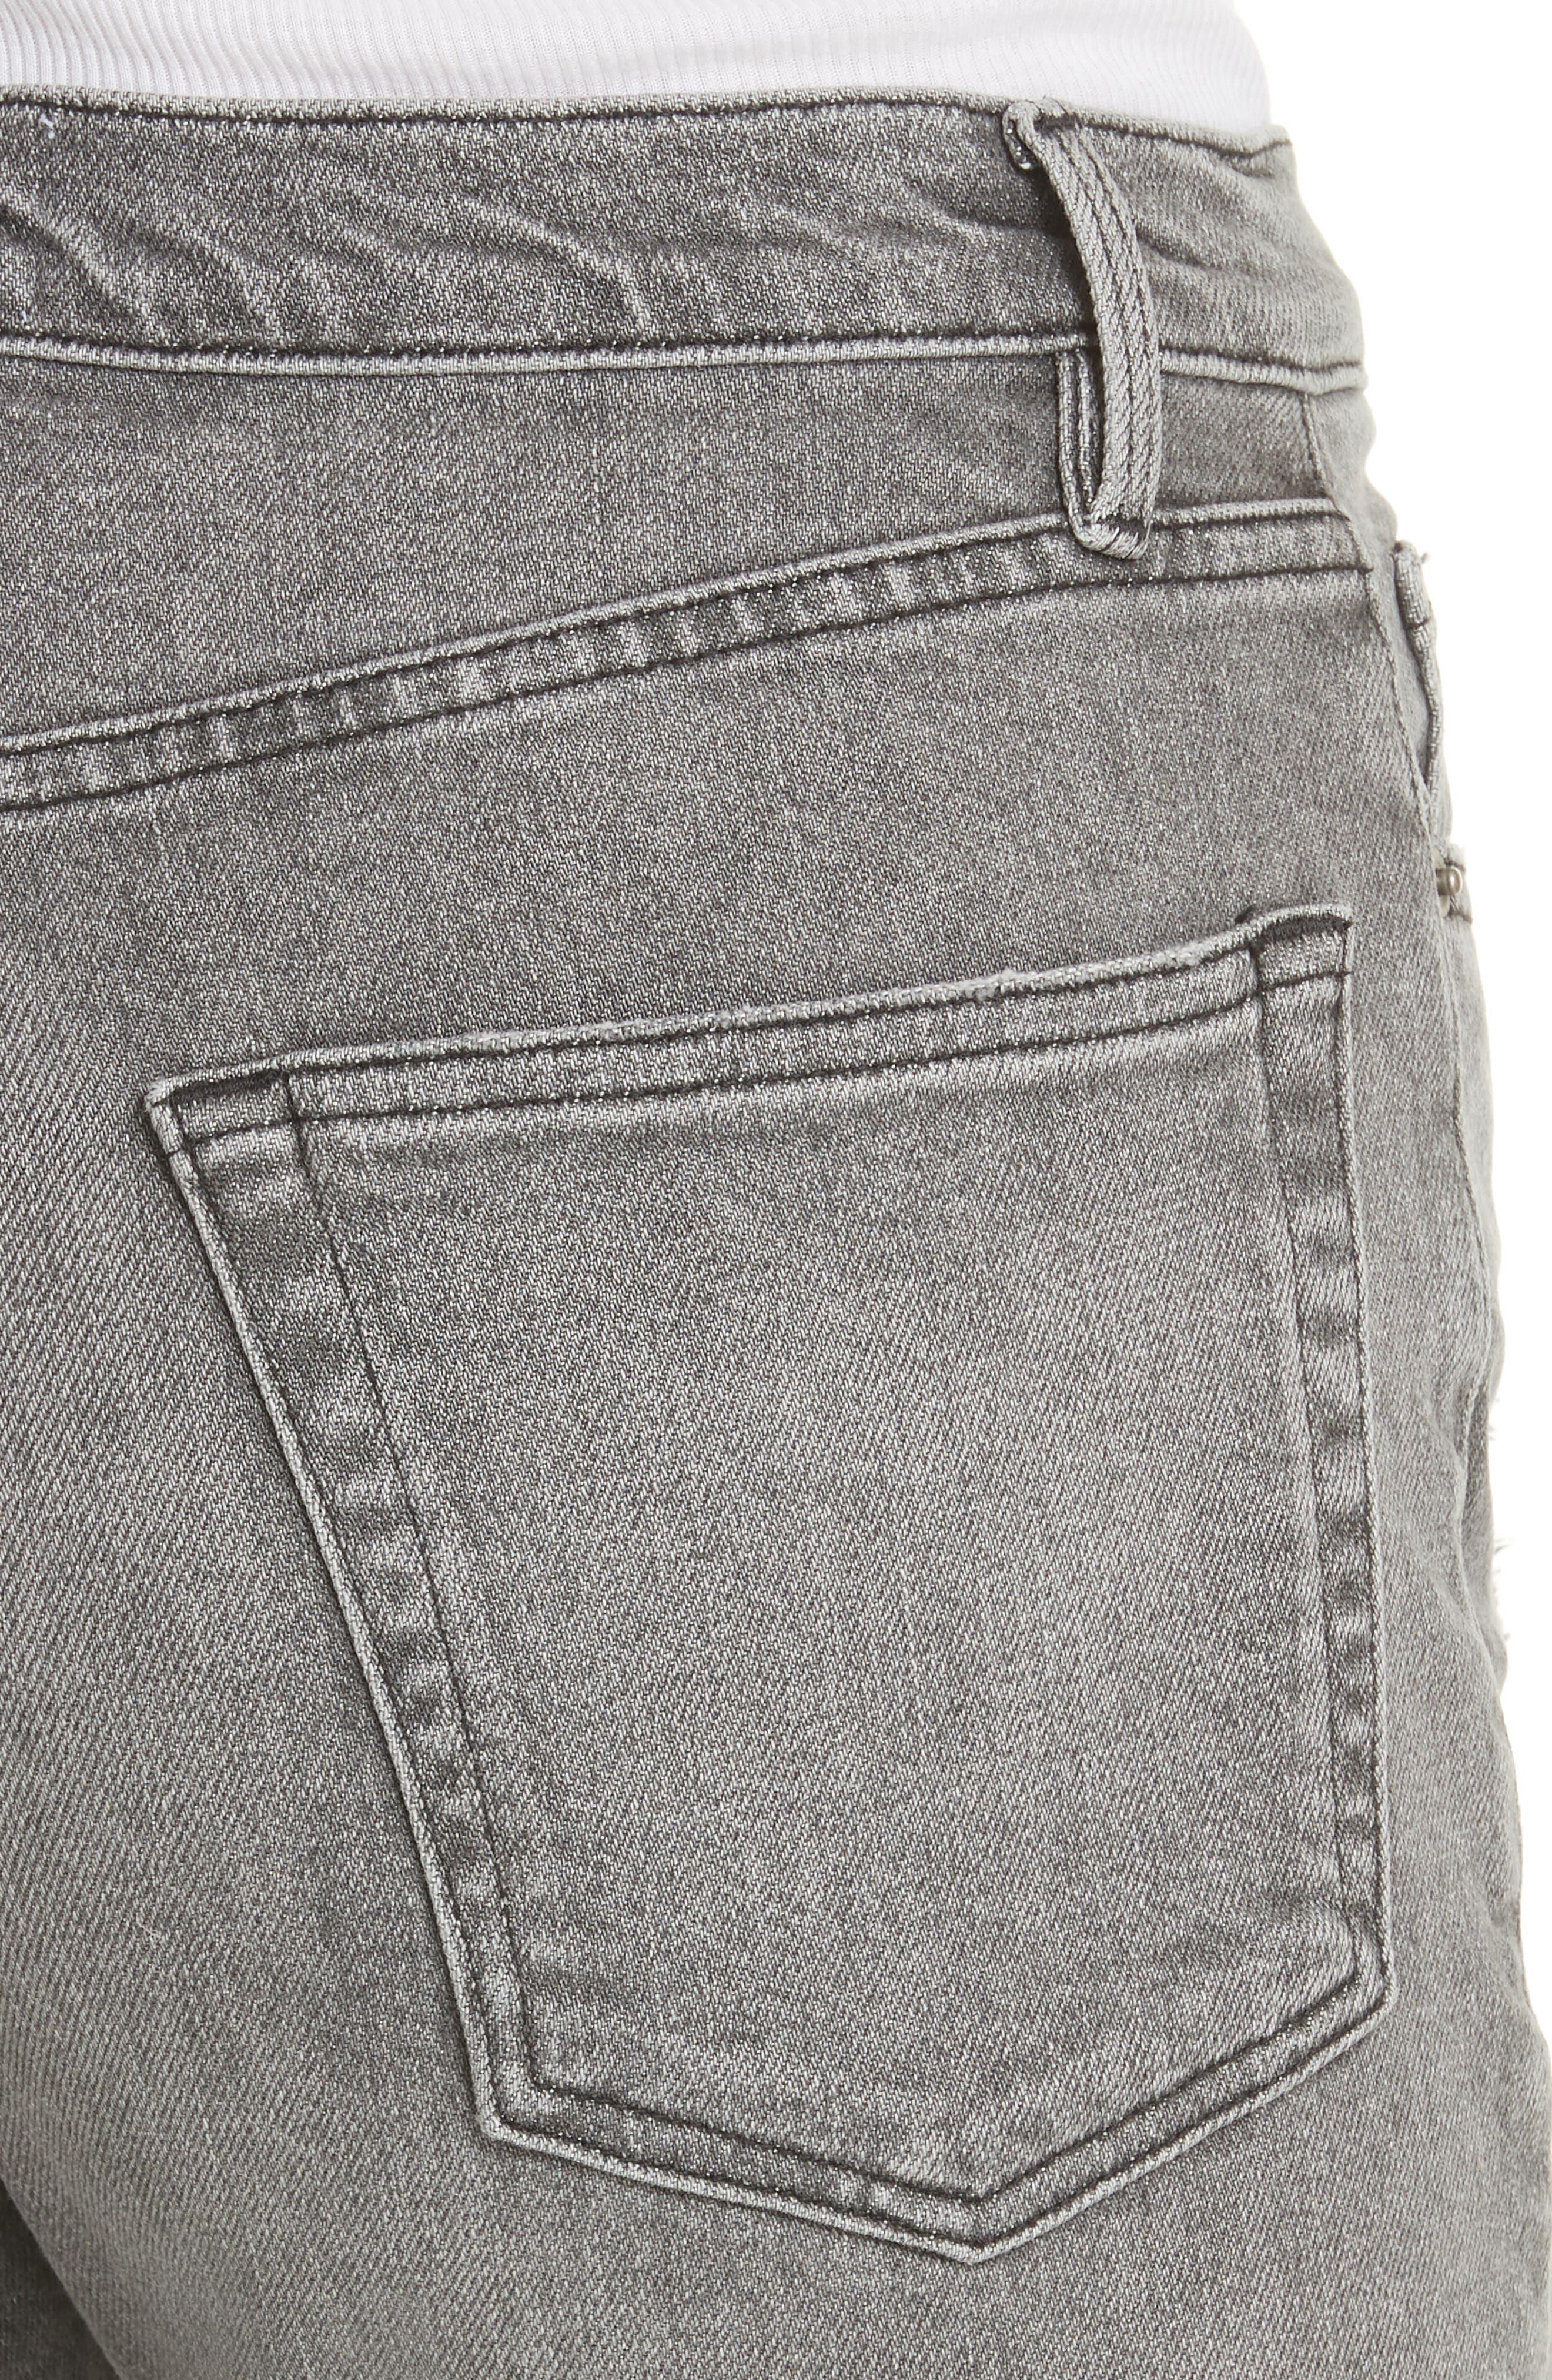 Le Original High Waist Raw Edge Jeans,                             Alternate thumbnail 4, color,                             COLD ASH